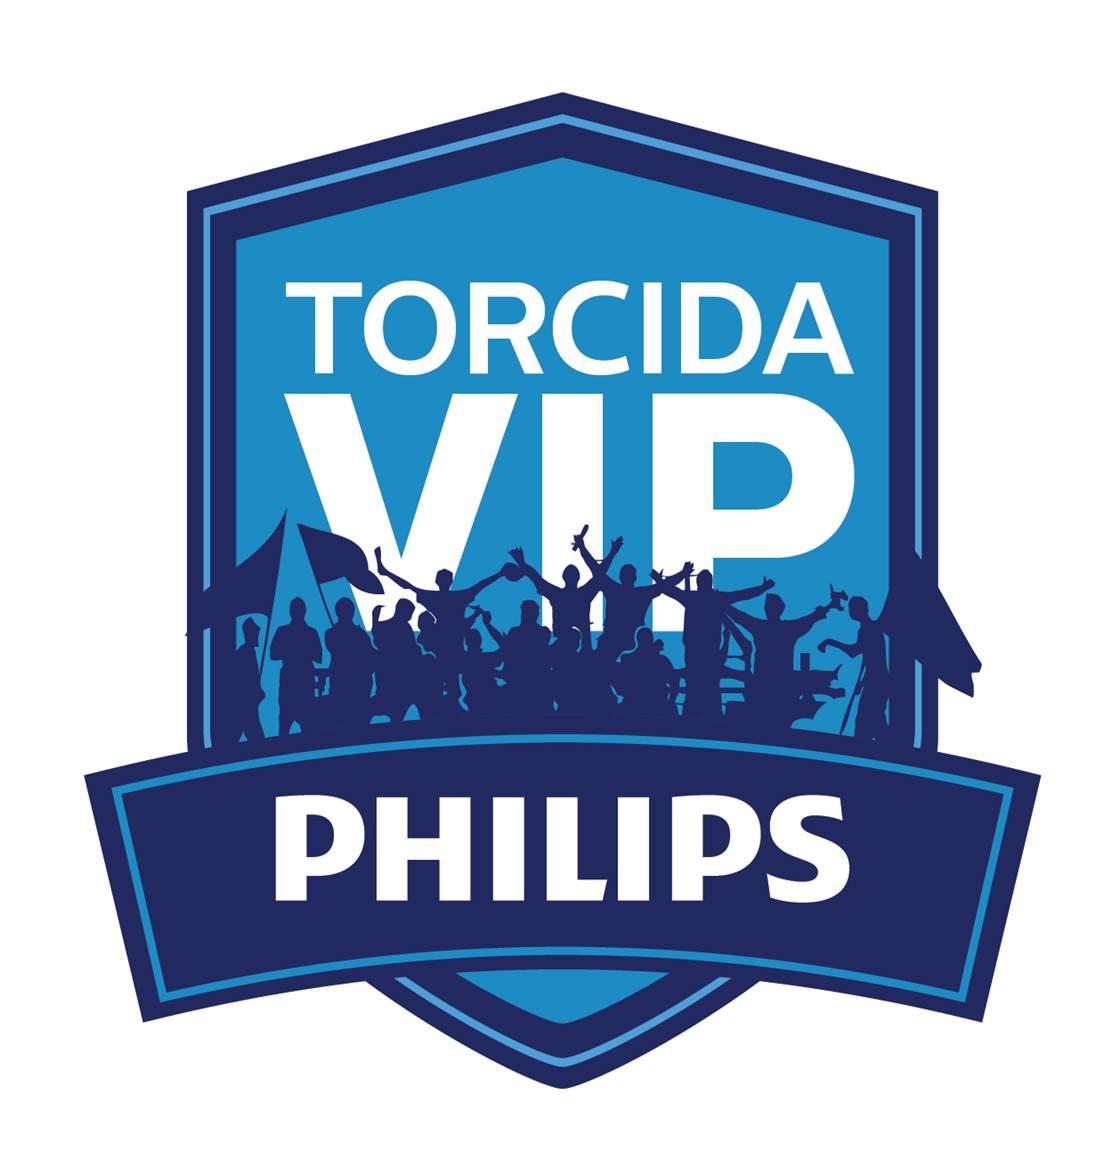 TORNEIO TORCIDA VIP PHILIPS